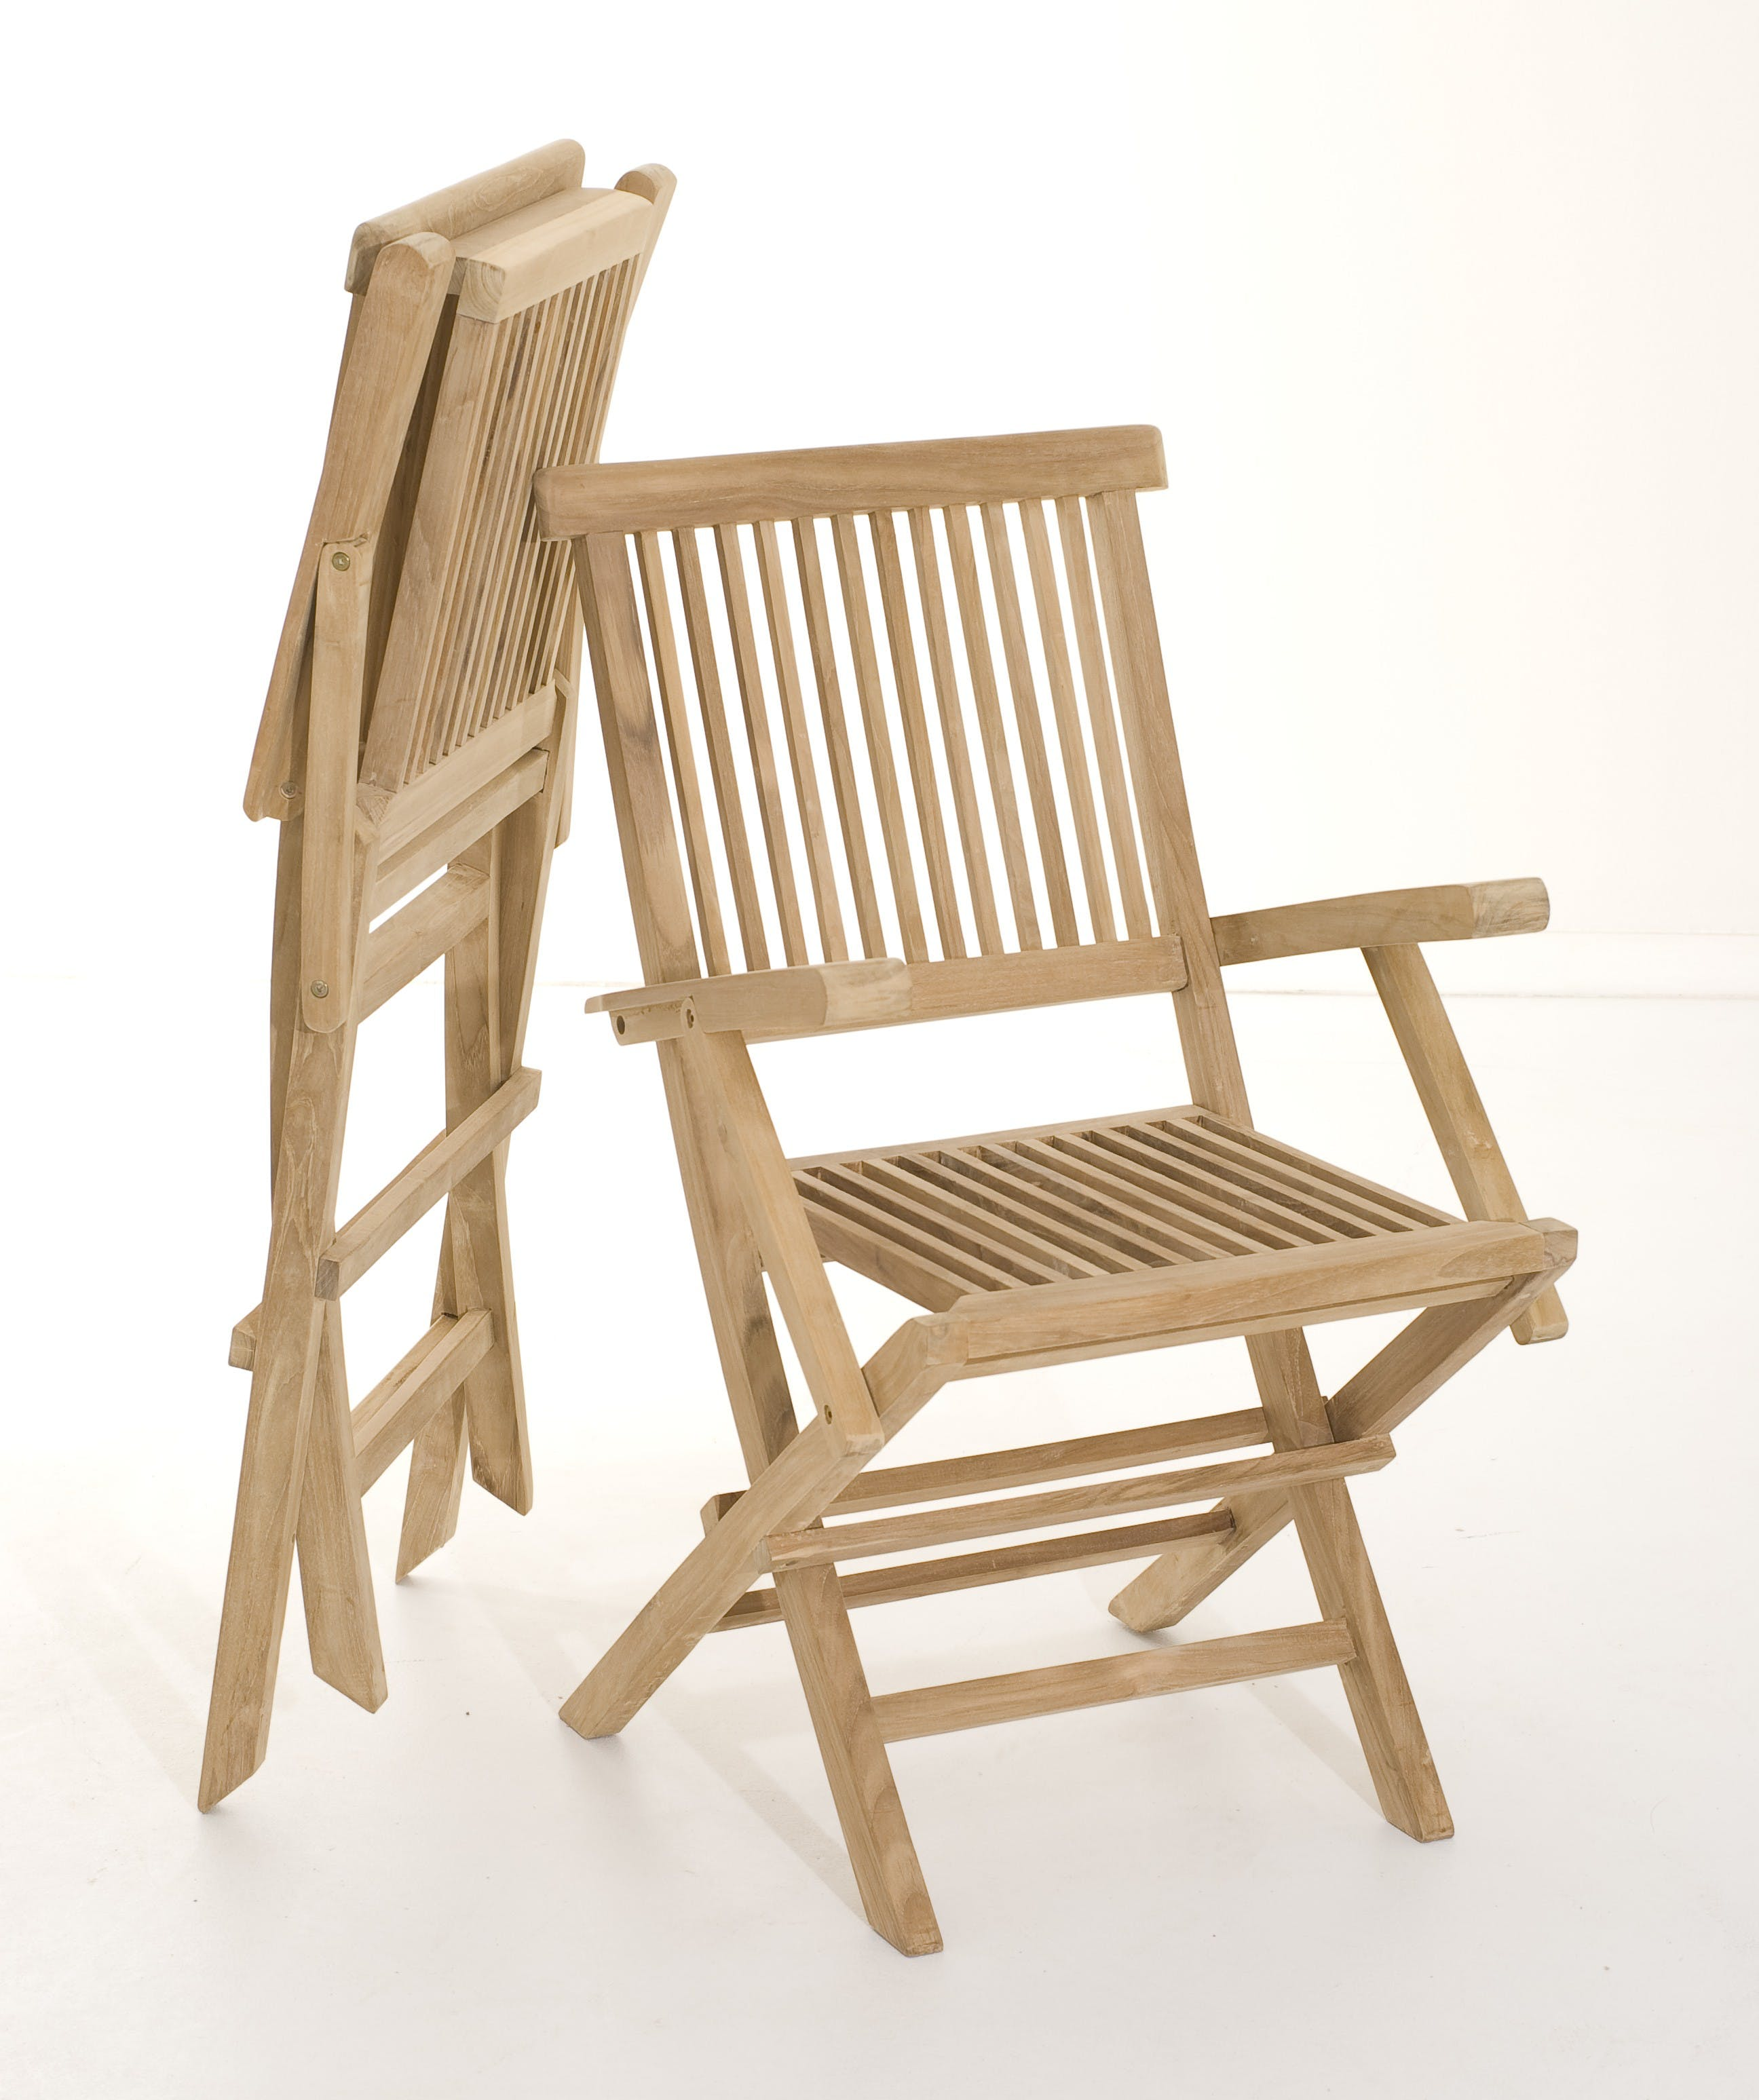 Lot de 2 fauteuils de jardin pliant Java en Teck 90 cm SUMMER